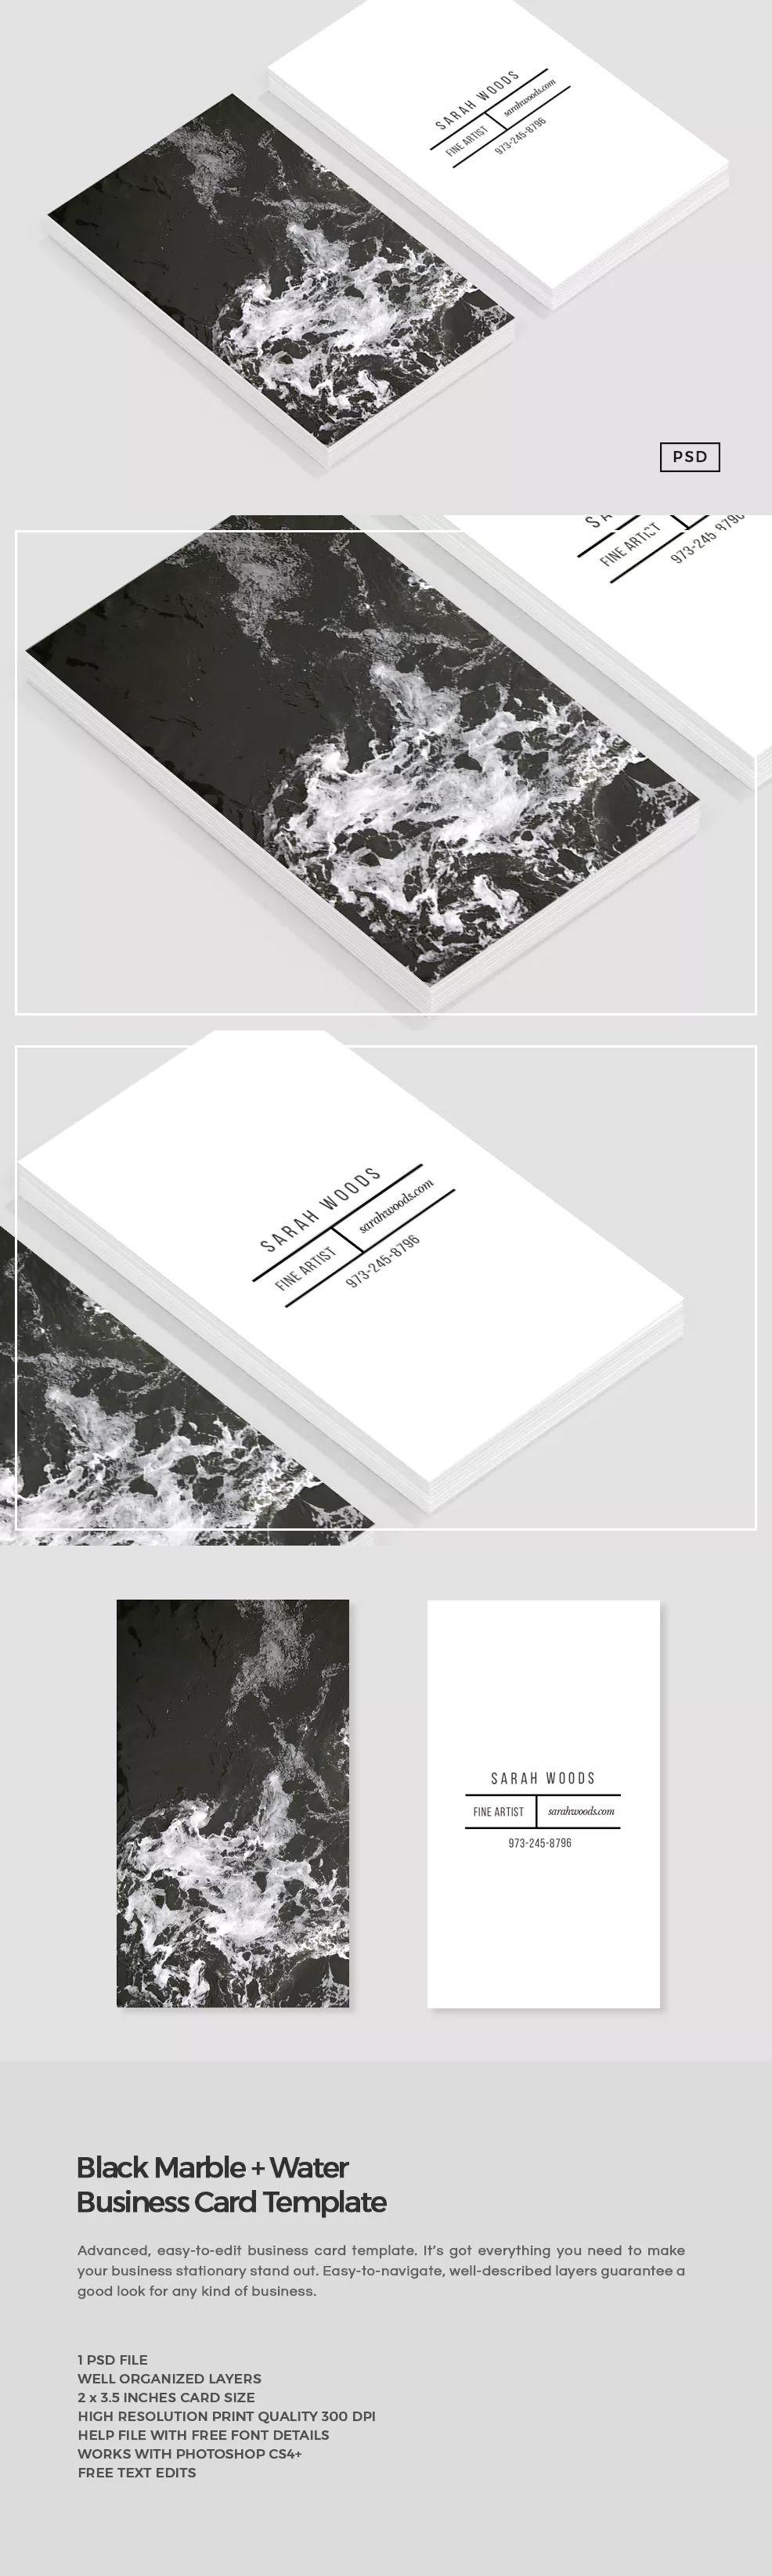 Black Marble Business Card Template PSD   Kartvizit   Pinterest ...